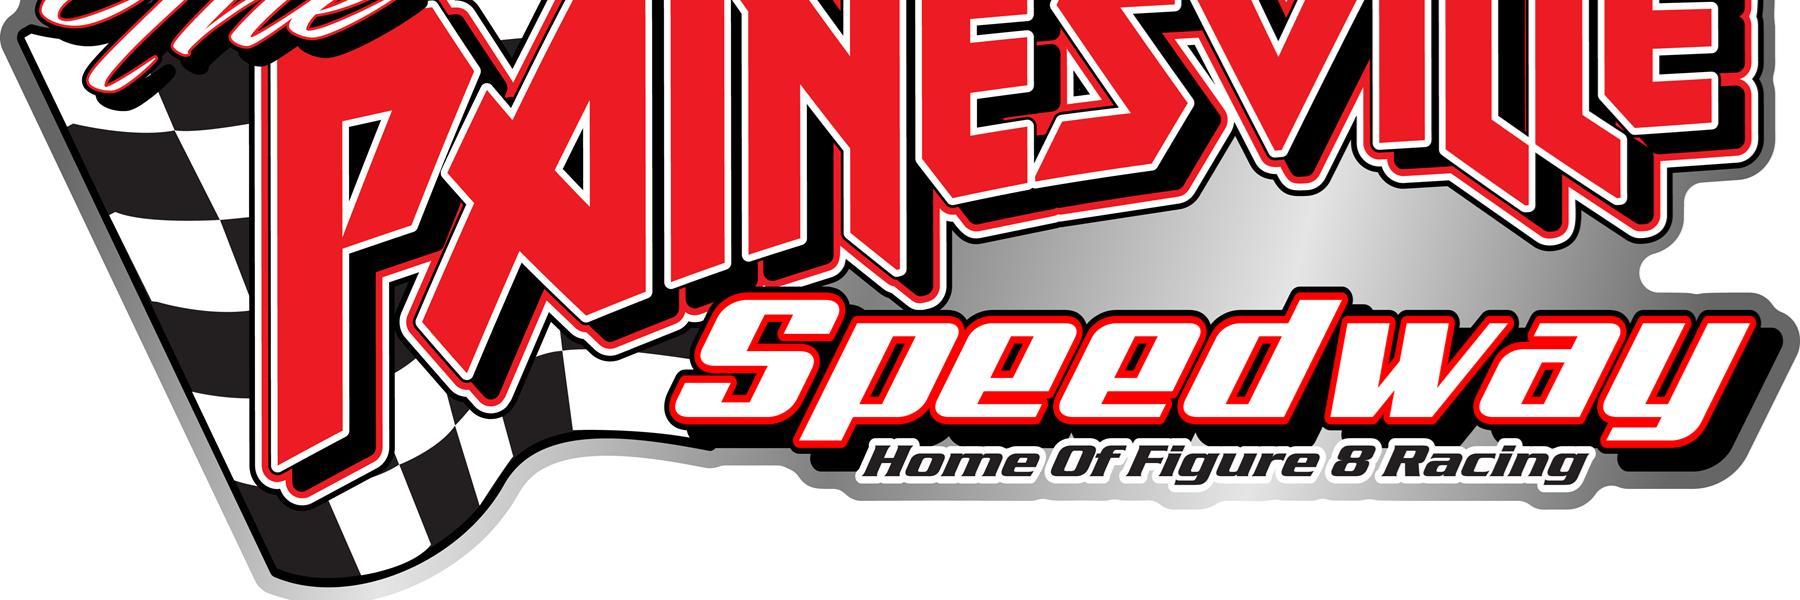 Painesville Speedway